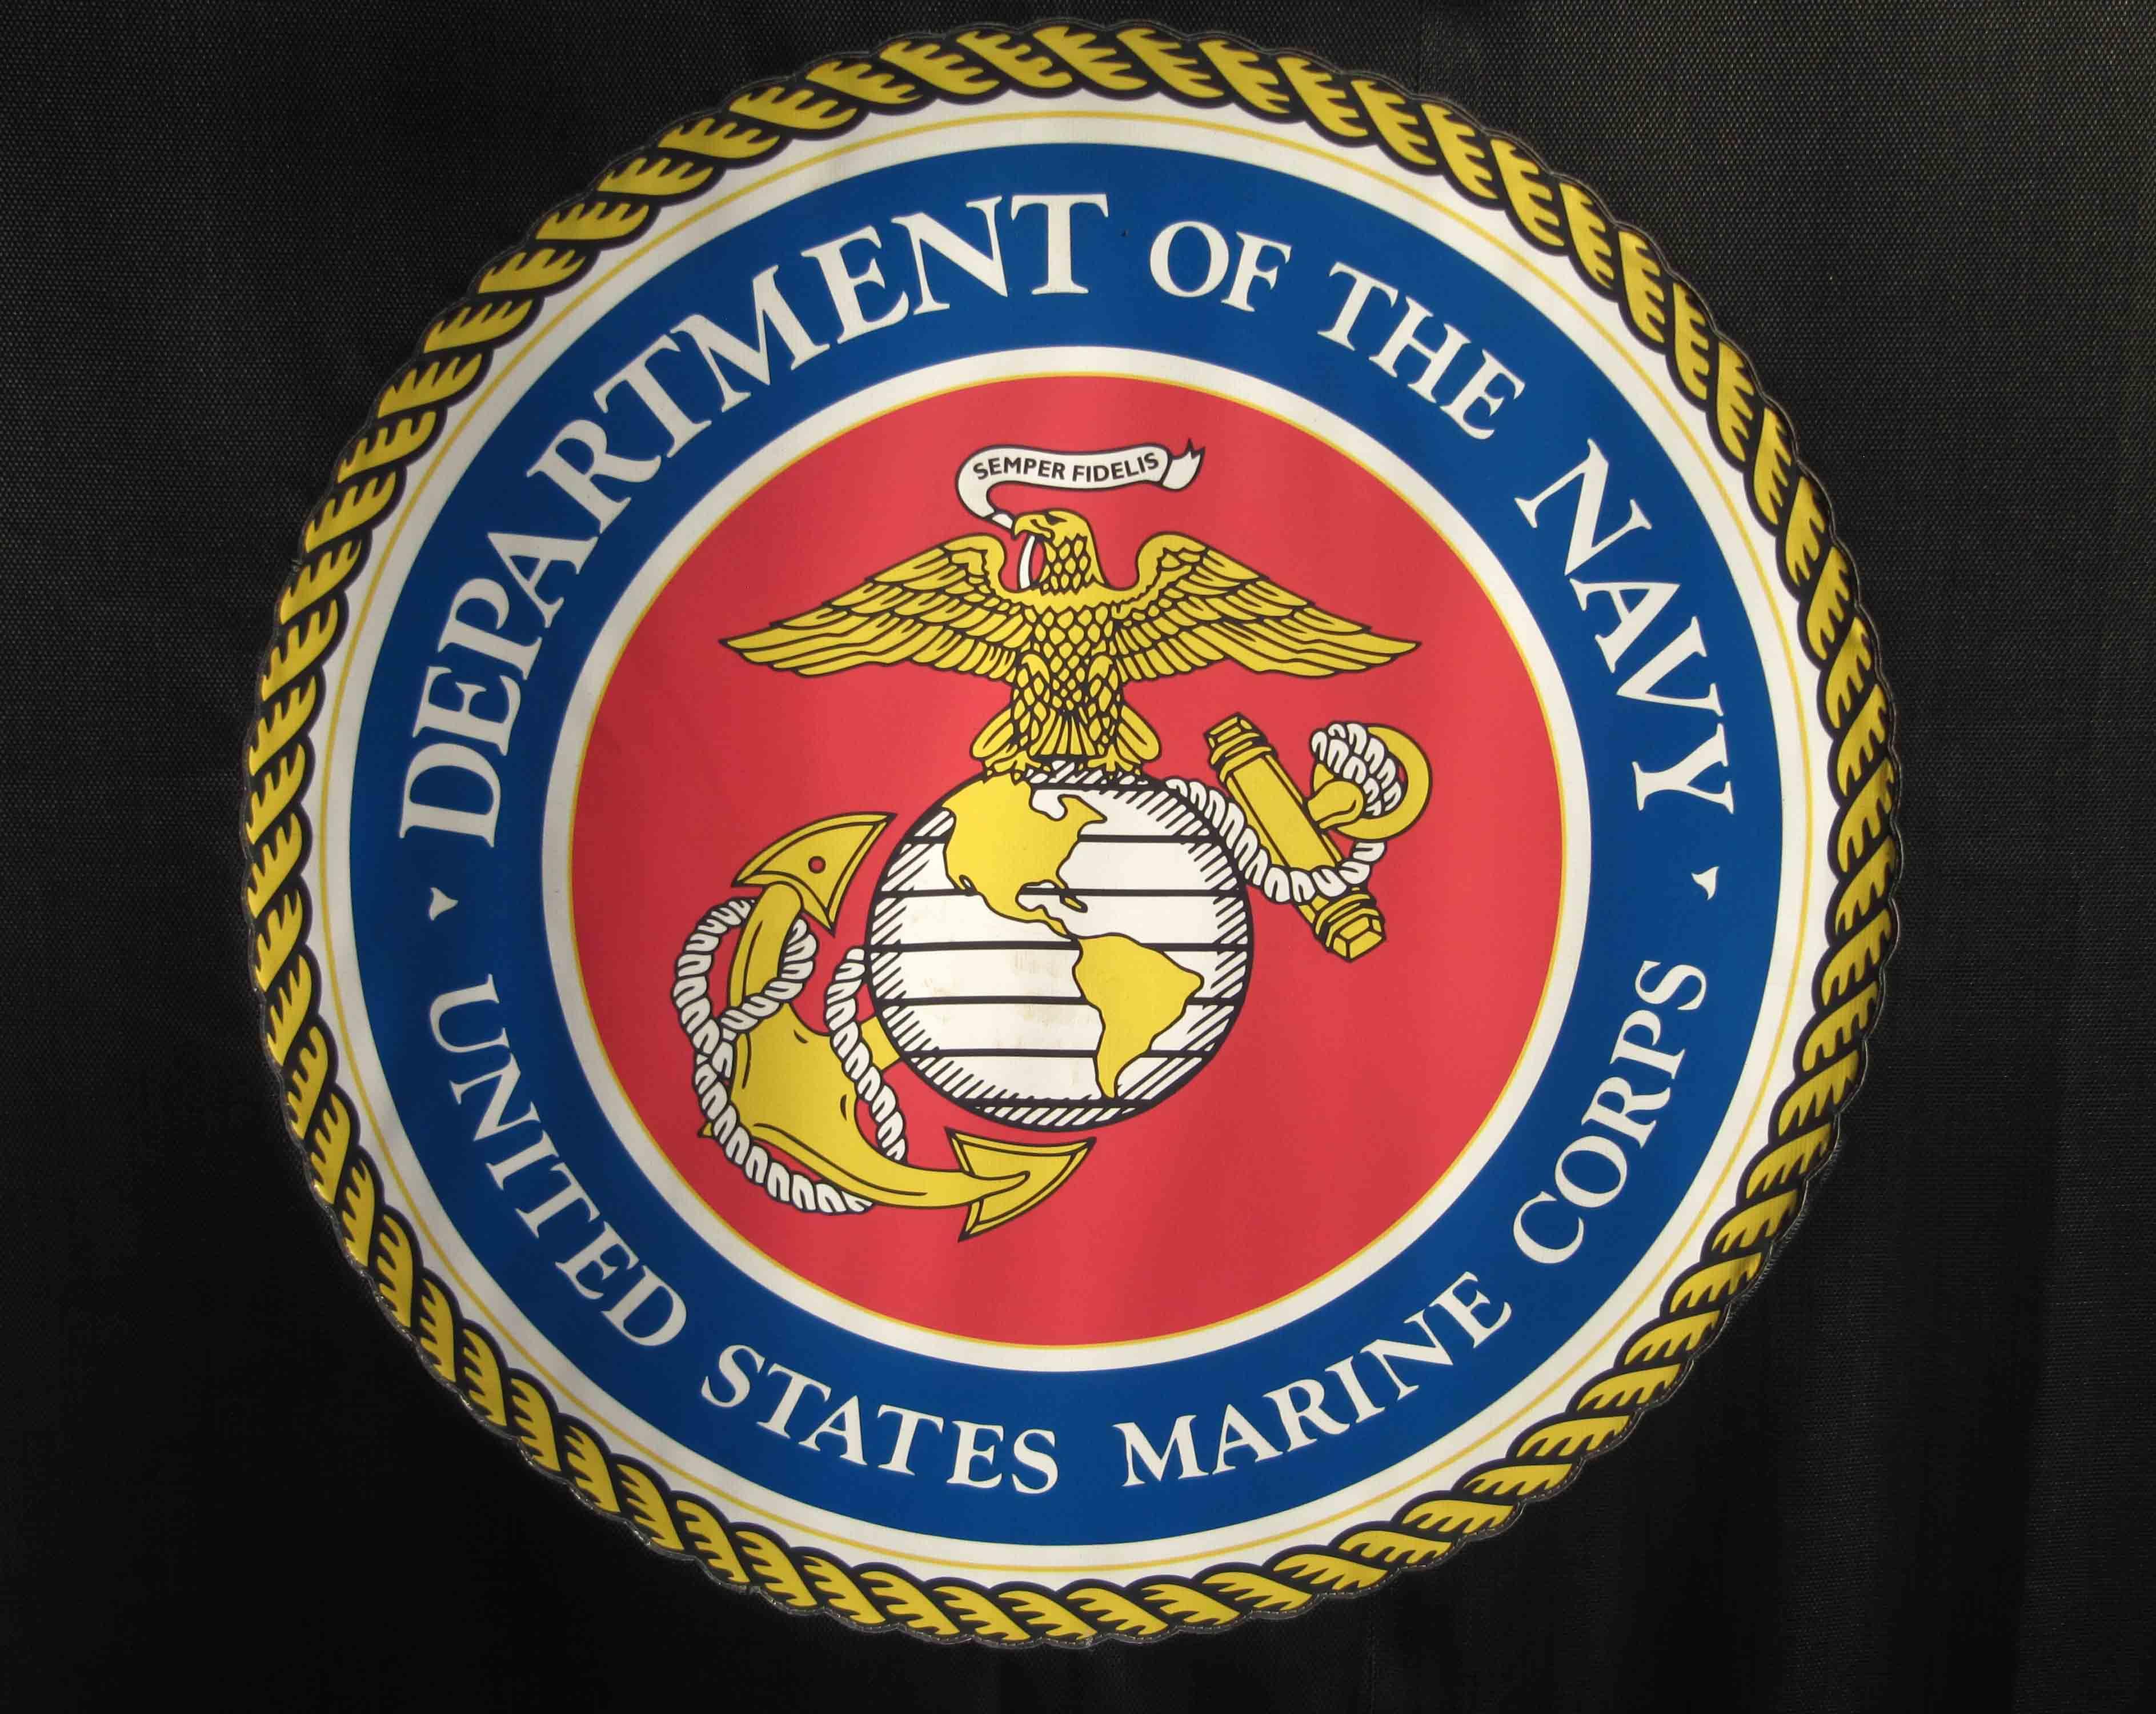 marine corps logo wallpaper - photo #29